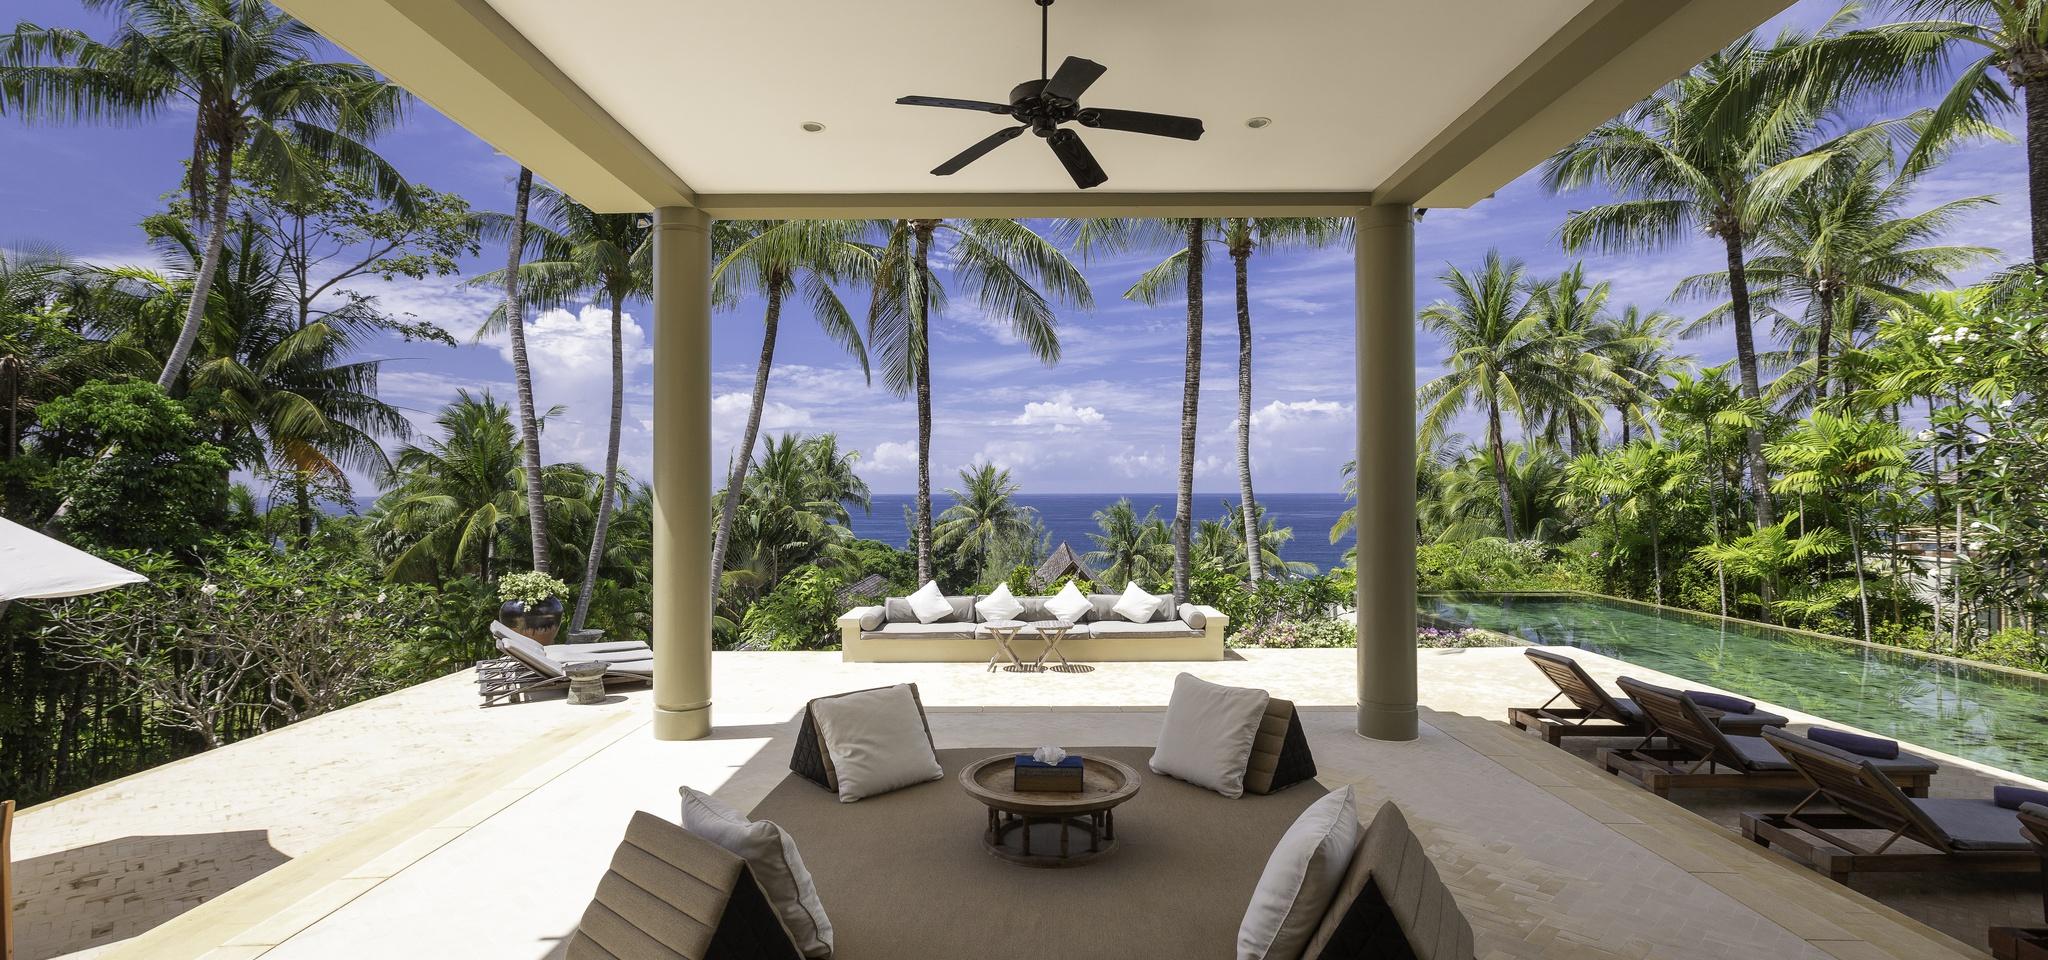 sea views in luxury villa in thailand